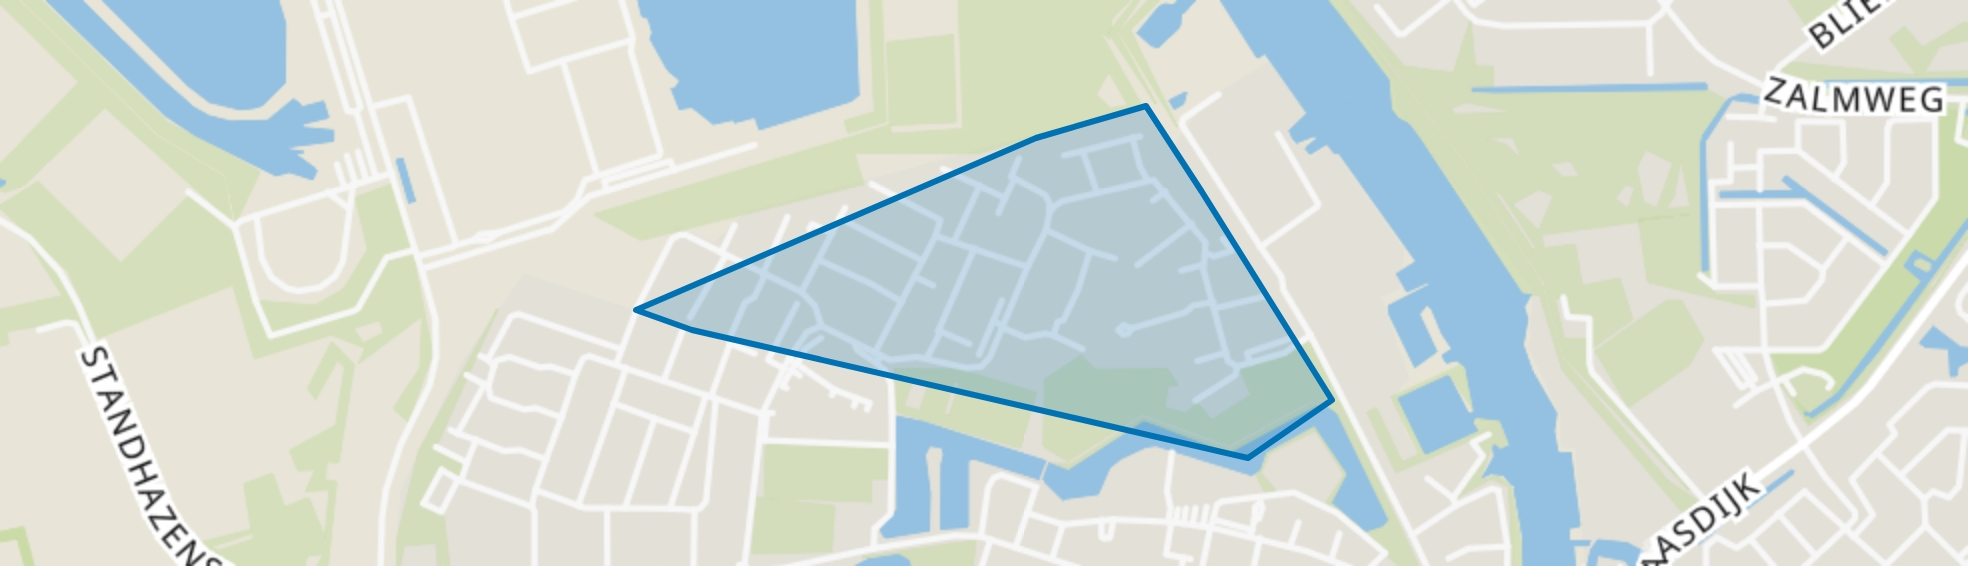 Geertruidenberg-Noord, Geertruidenberg map